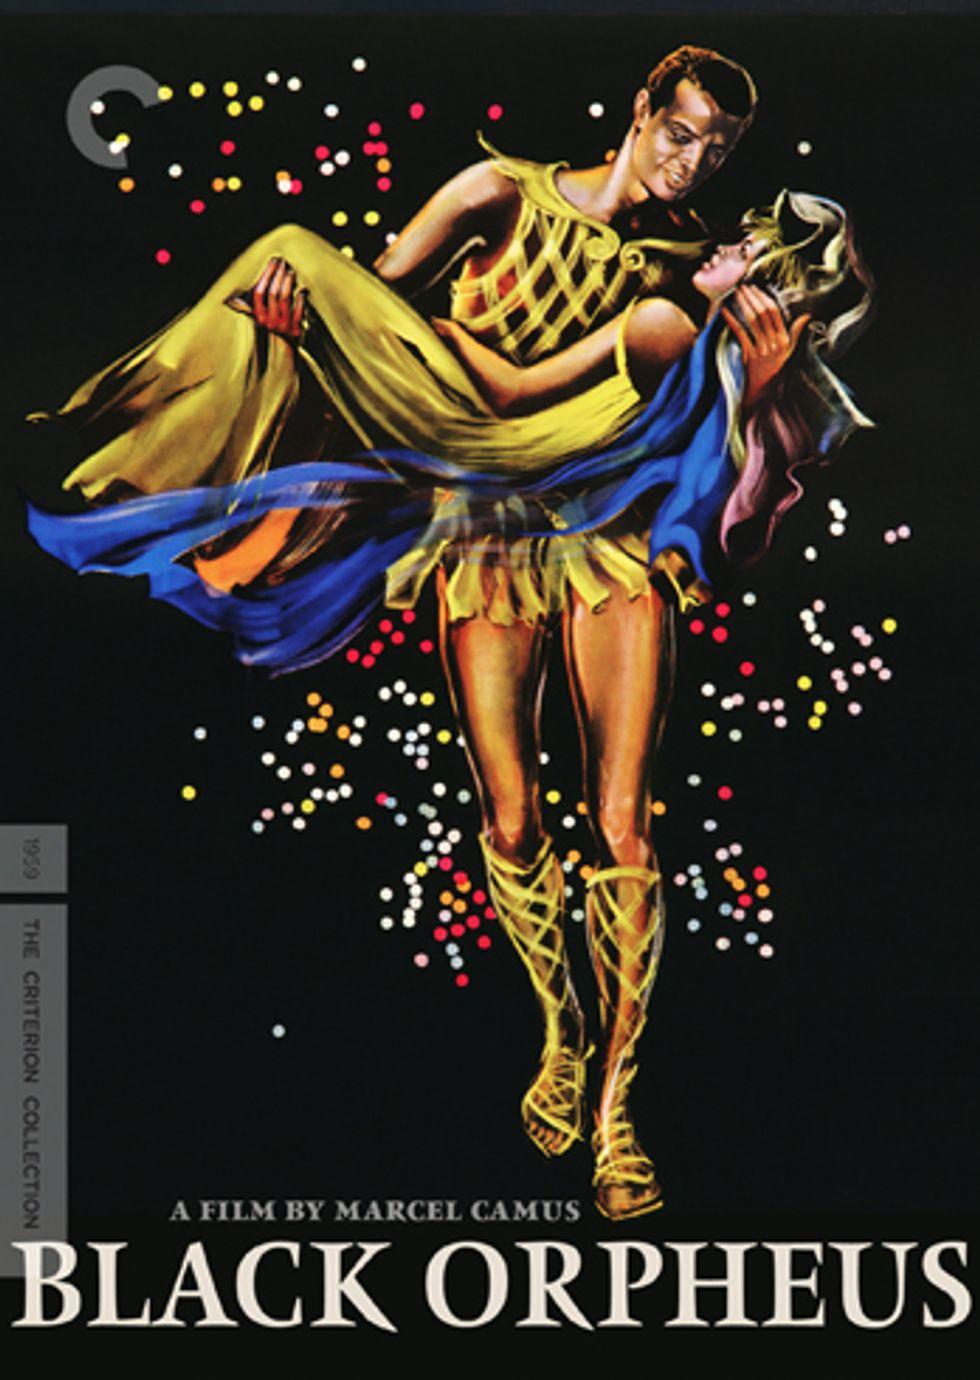 Black Orpheus On Criterion DVD!